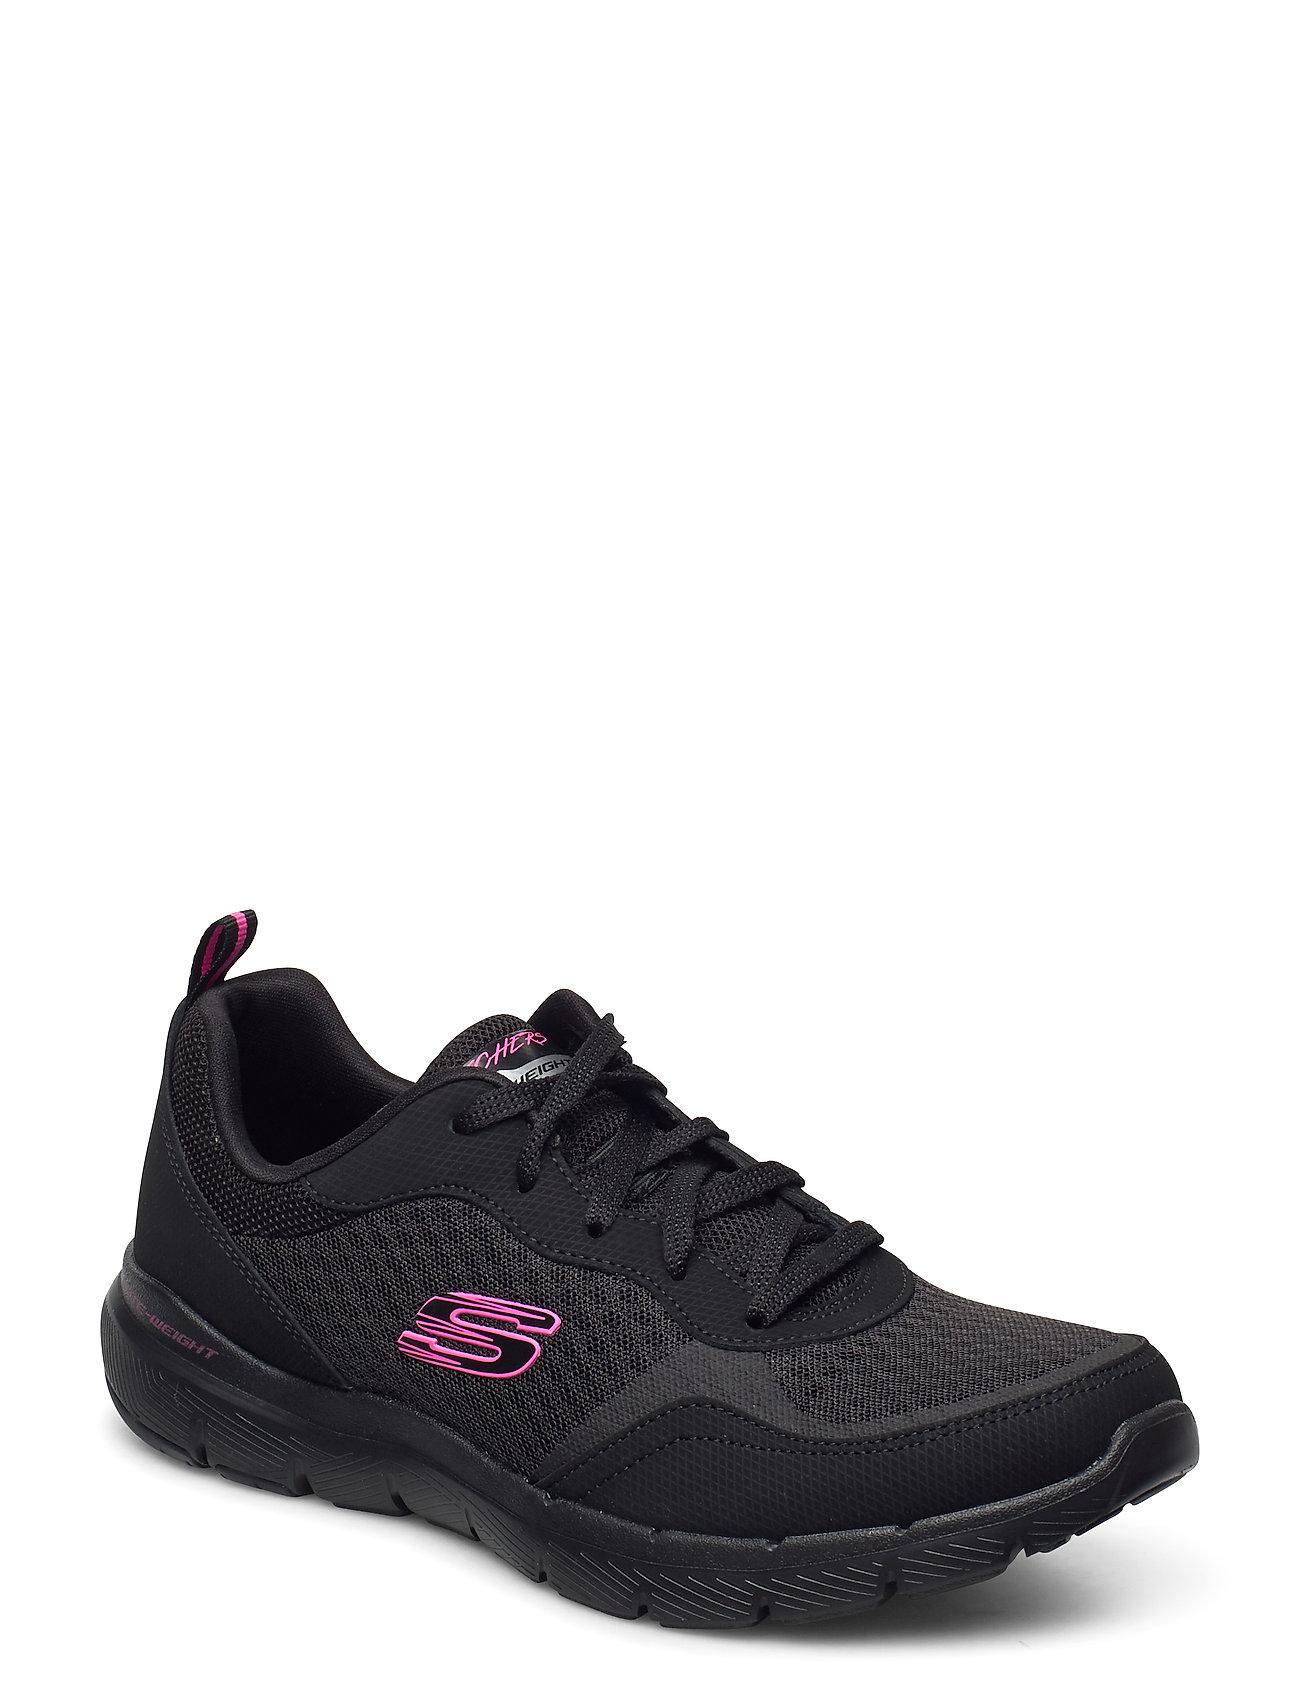 Womens Flex Appeal 3.0 - Go Forward Low-top Sneakers Sort Skechers